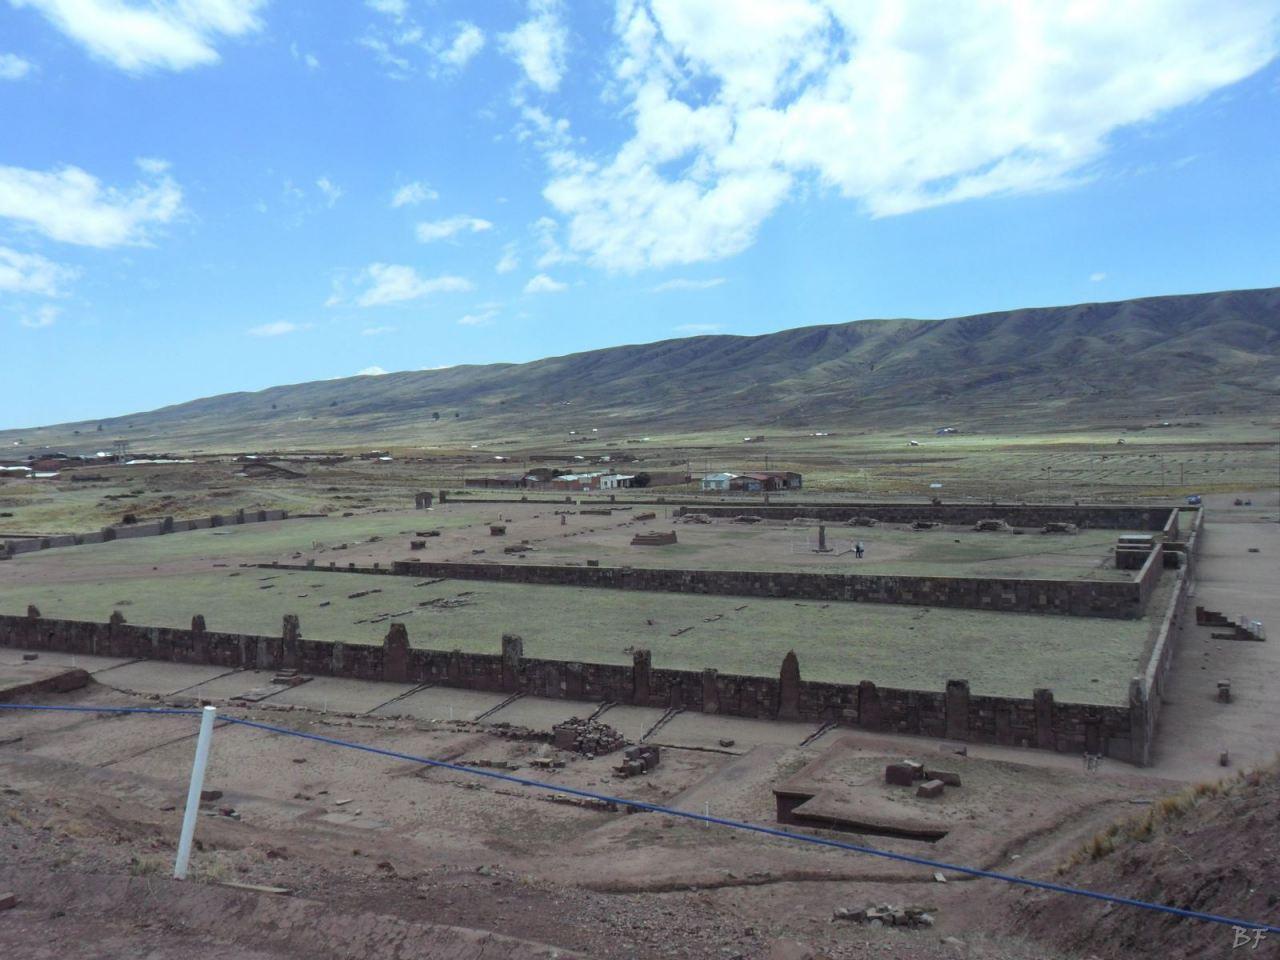 Sito-Megalitico-Piramide-Akapana-Kalasasaya-Menhir-Tiahuanaco-Bolivia-125